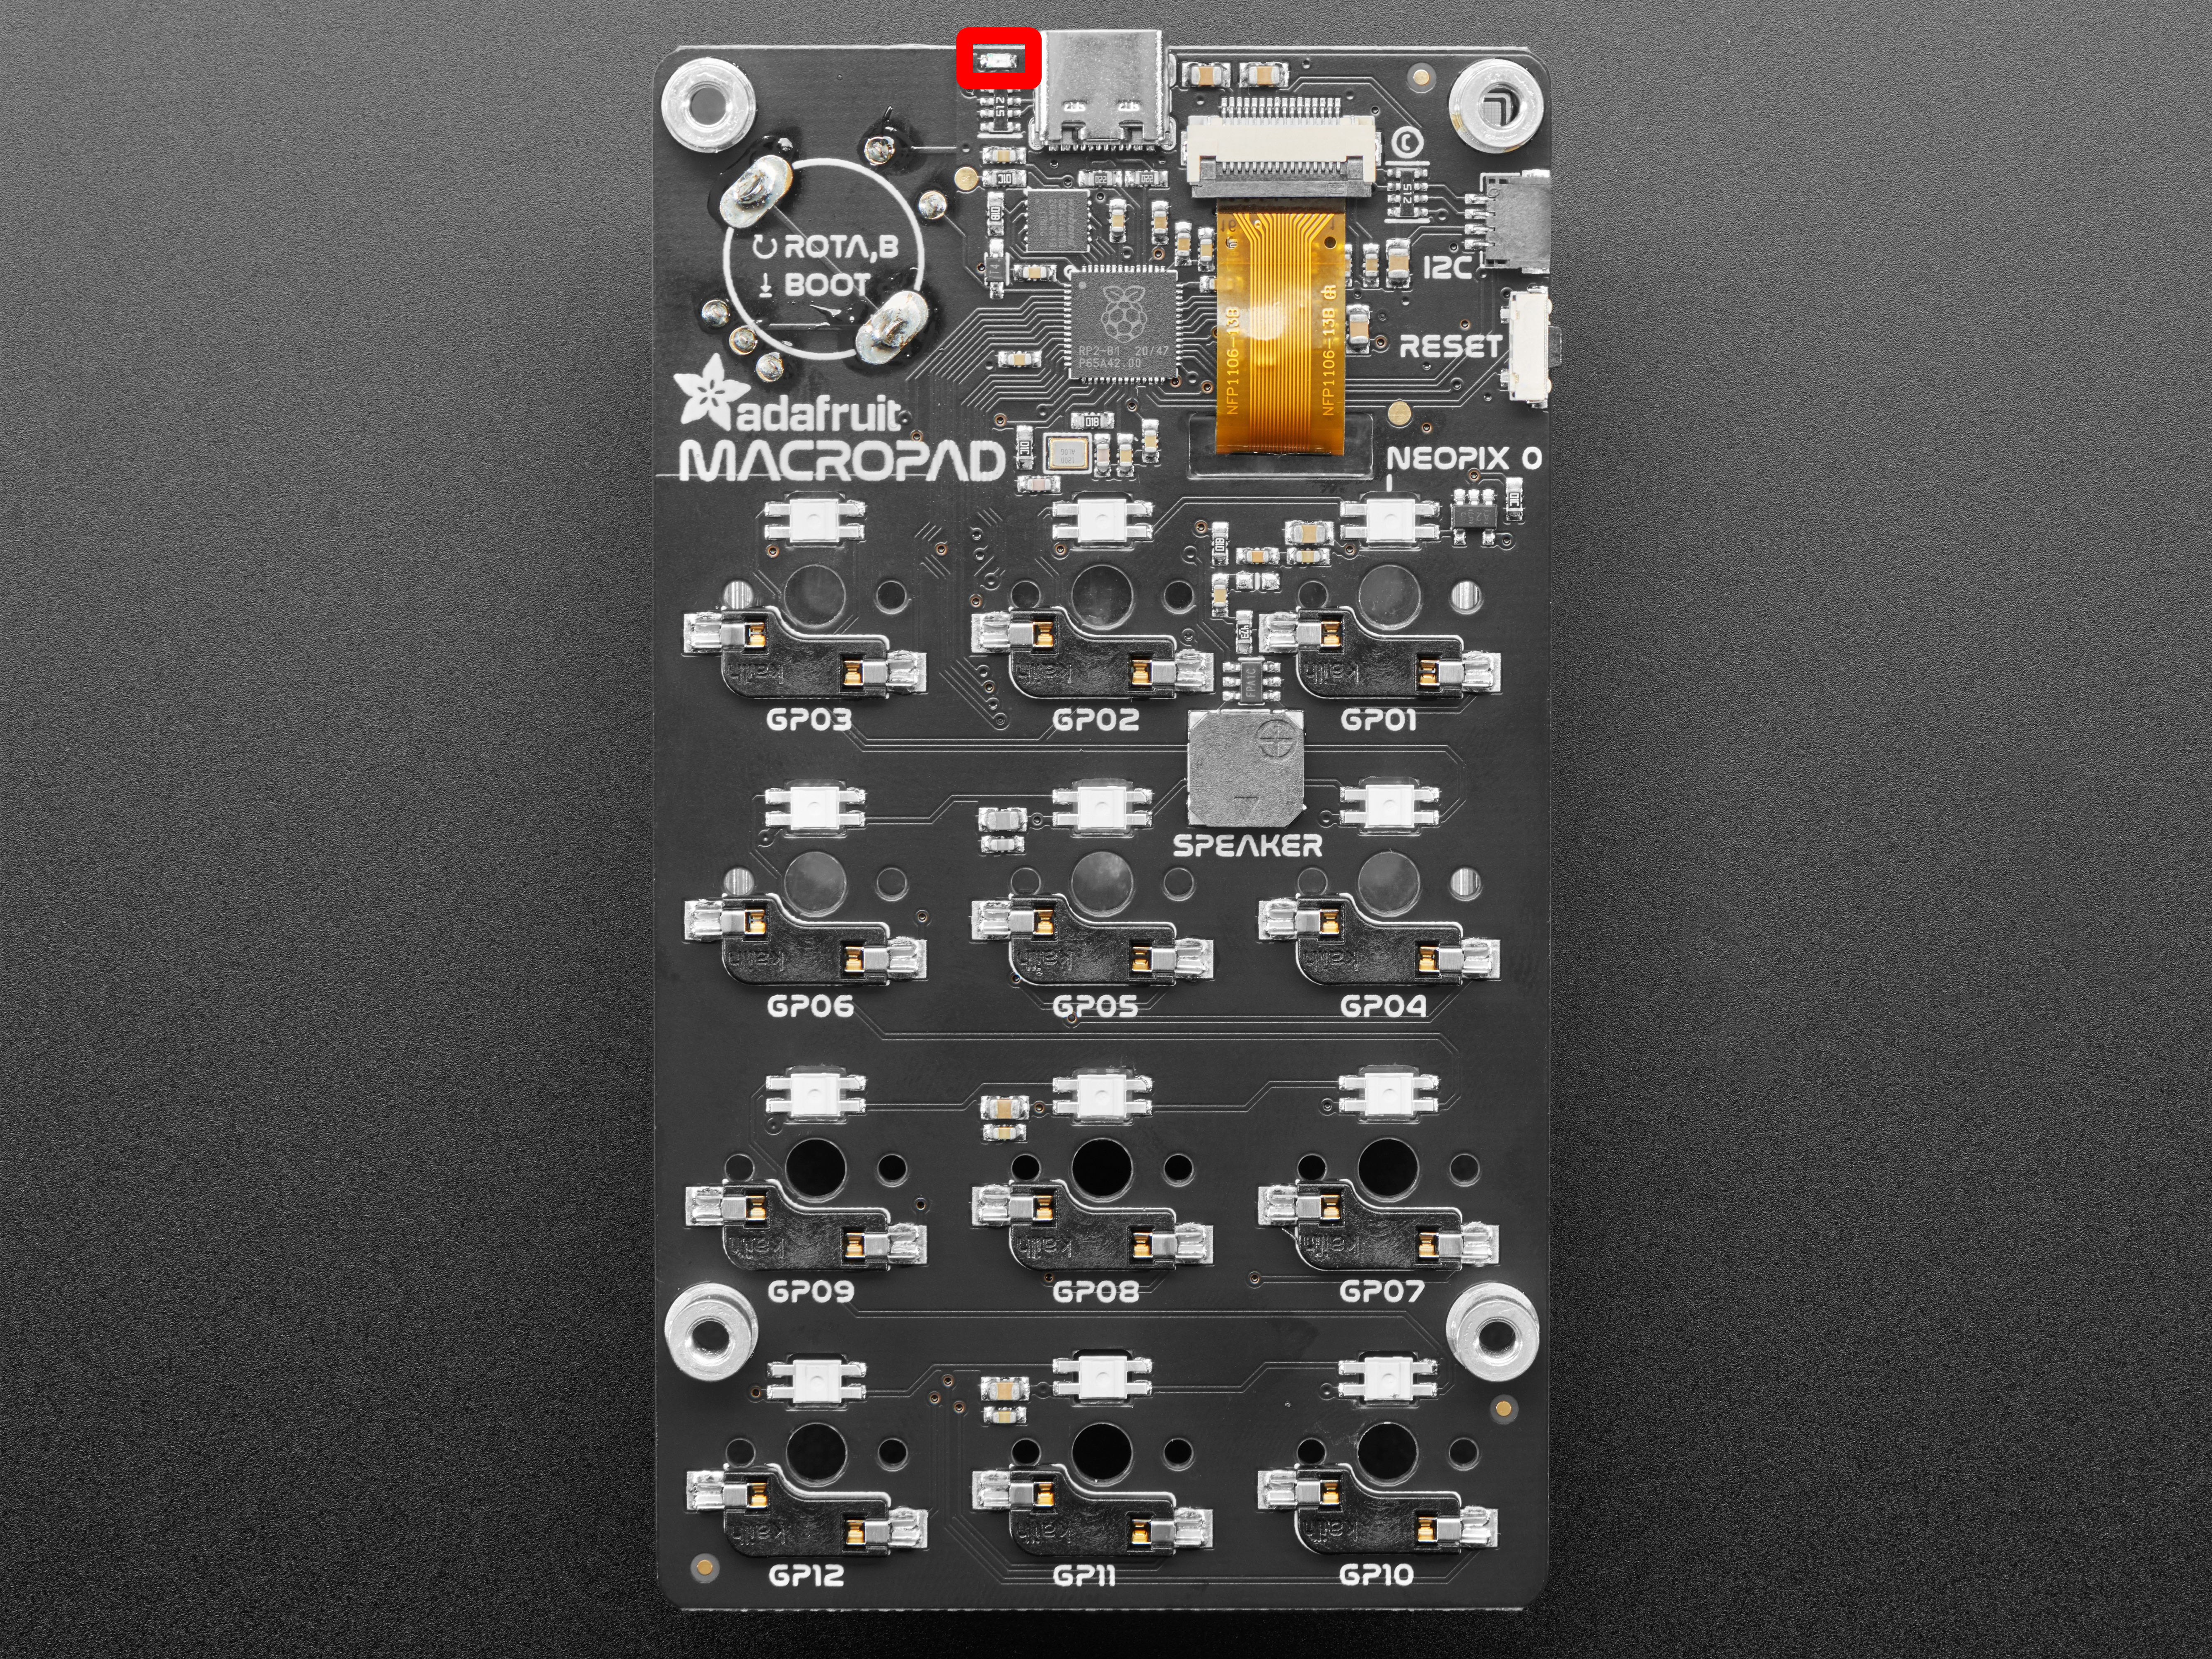 adafruit_products_MacroPad_red_LED.jpg